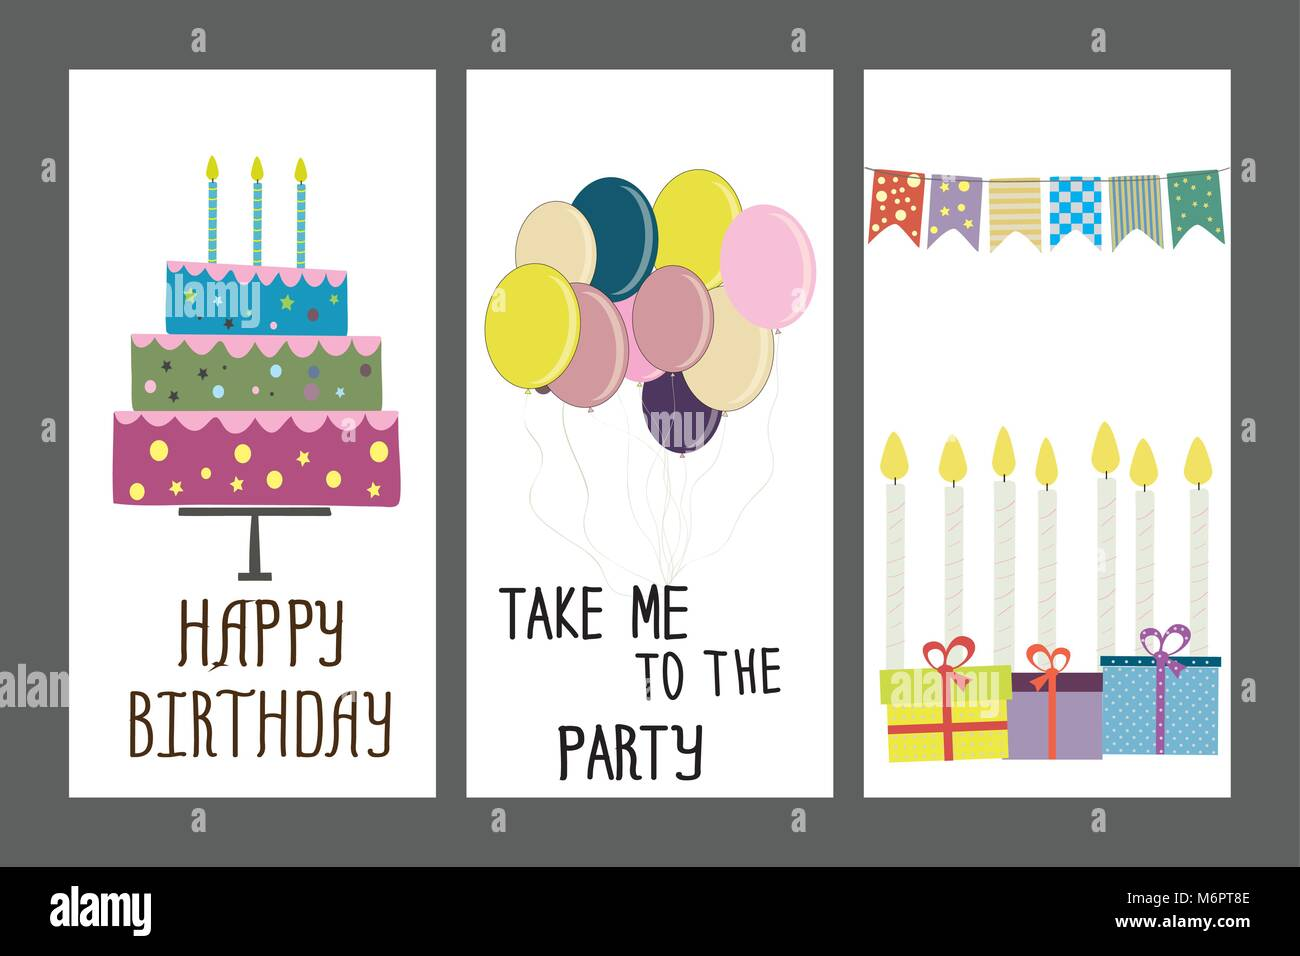 Happy birthday holiday greeting and invitation card layout stock happy birthday holiday greeting and invitation card layout template ock vector illustration stopboris Images